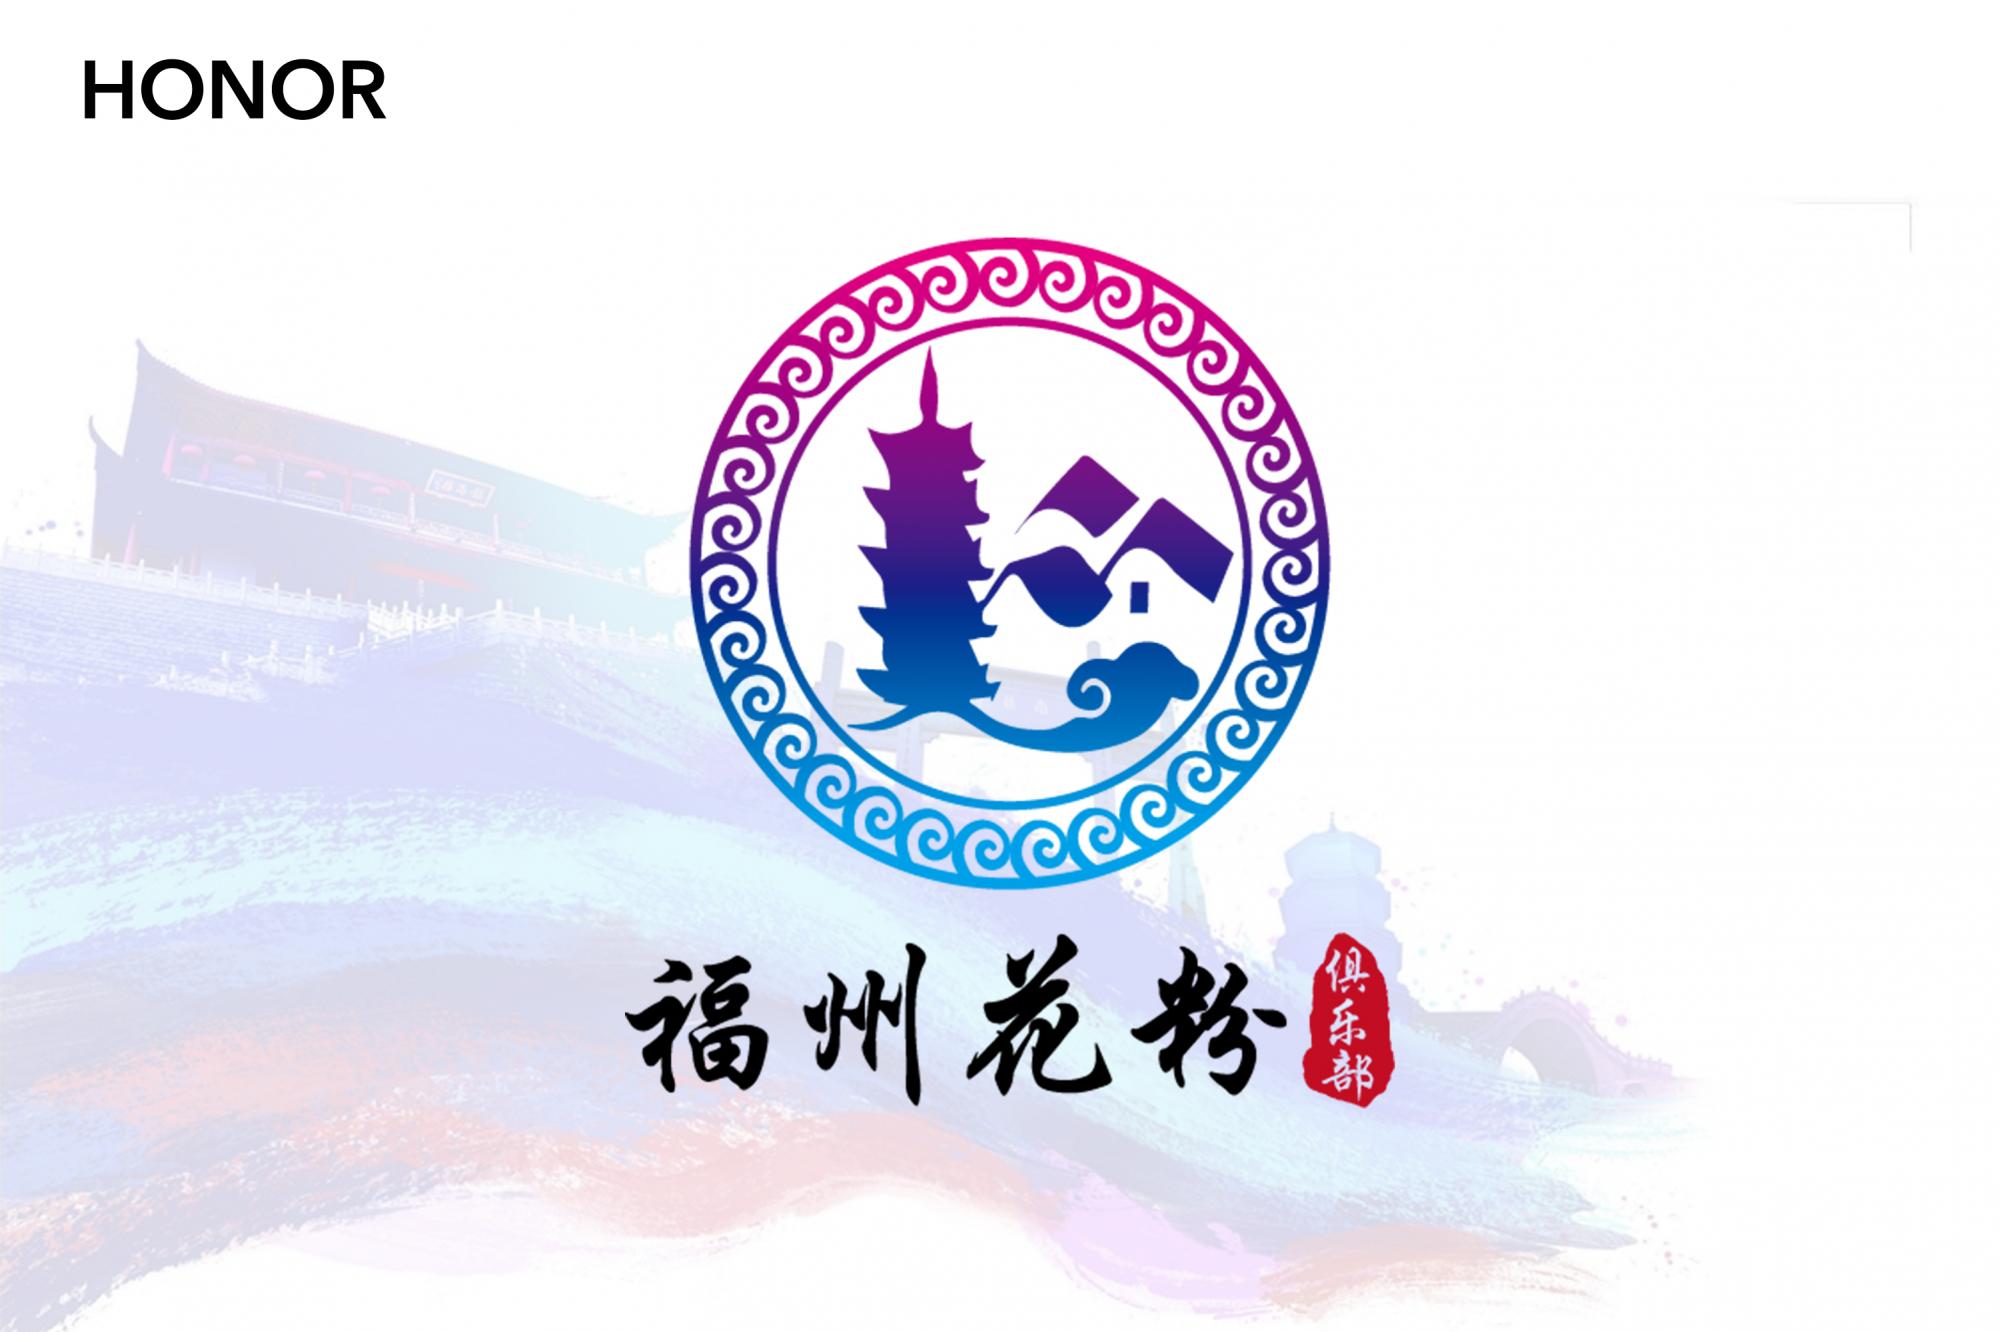 福州同城旗.png